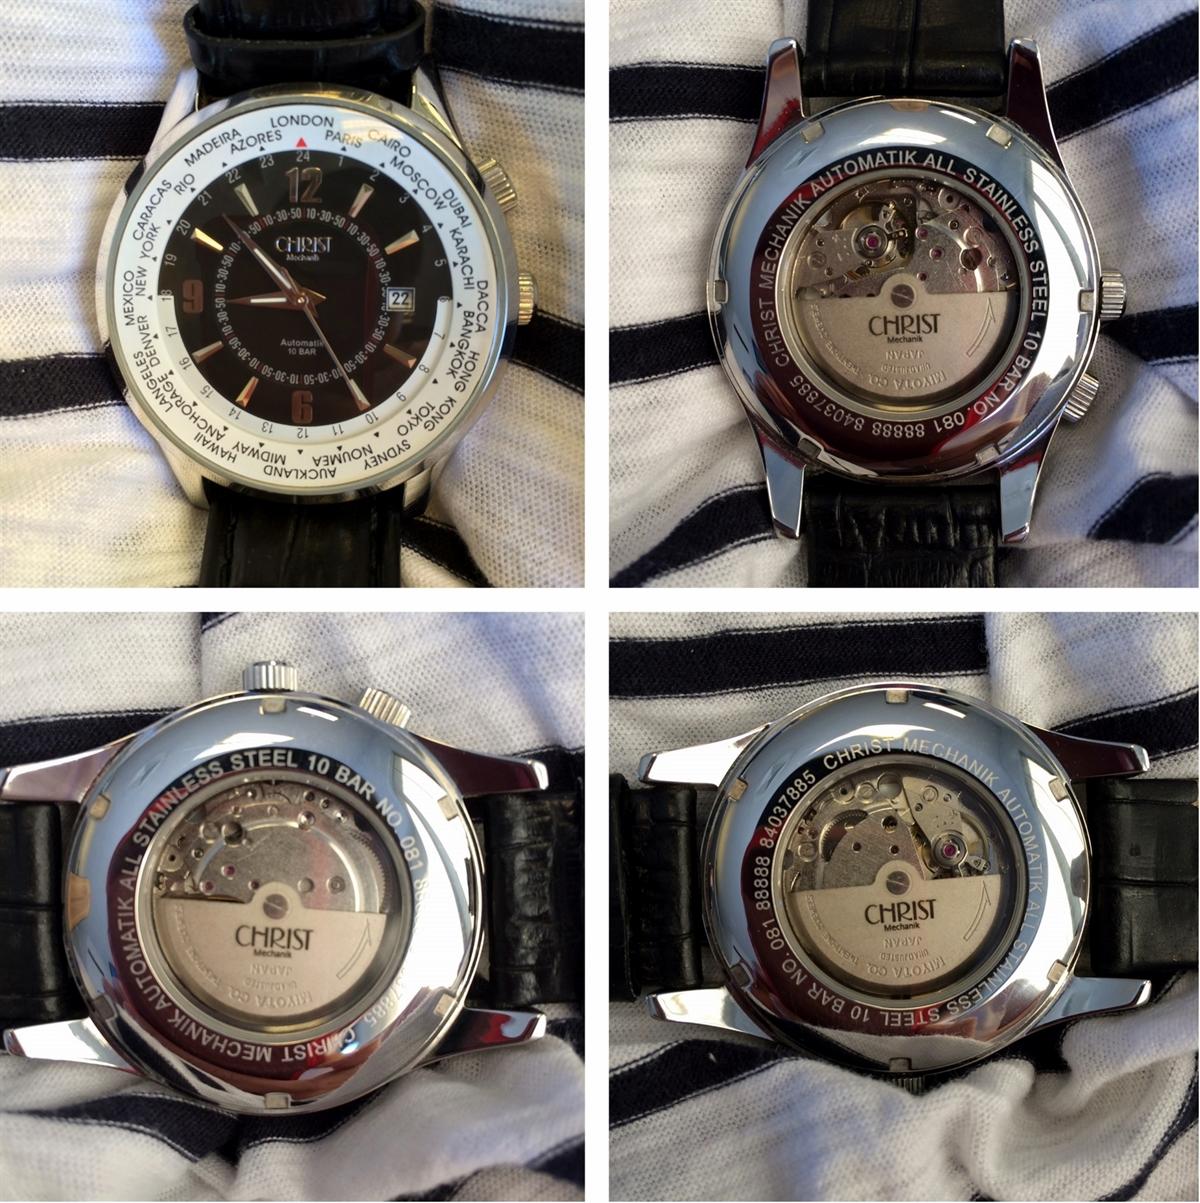 3 design z zegarkiem w ręku luksusowe zegarki SIHH Geneve lifestyle forelements blog